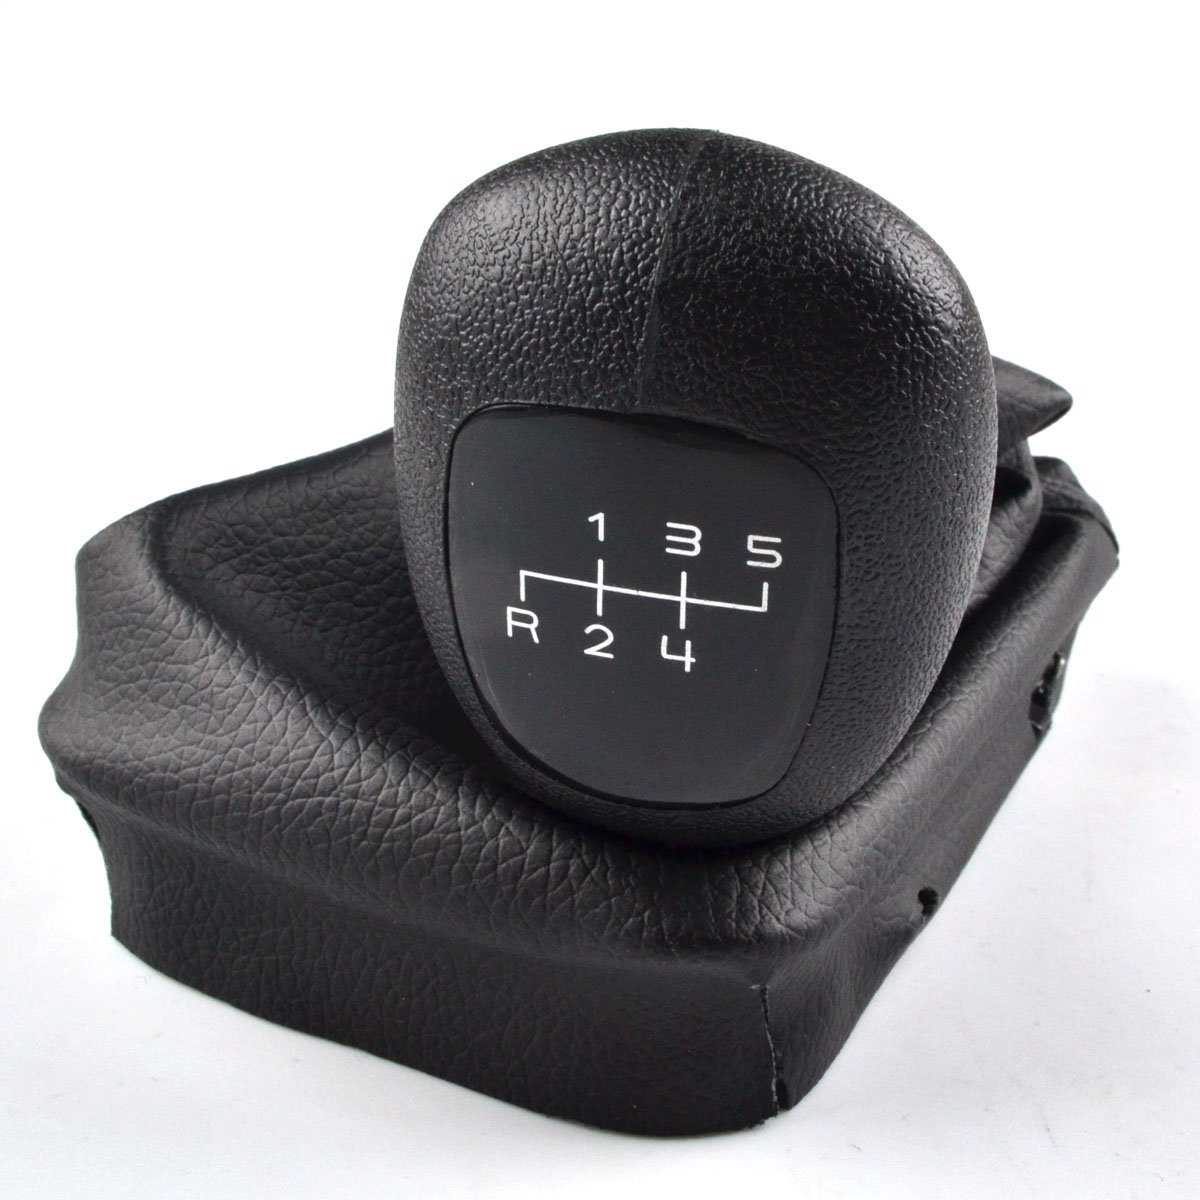 RunQiao 5 Gang Schaltknauf mit Schaltsack /& Rahmen Plug Play Komplett Set